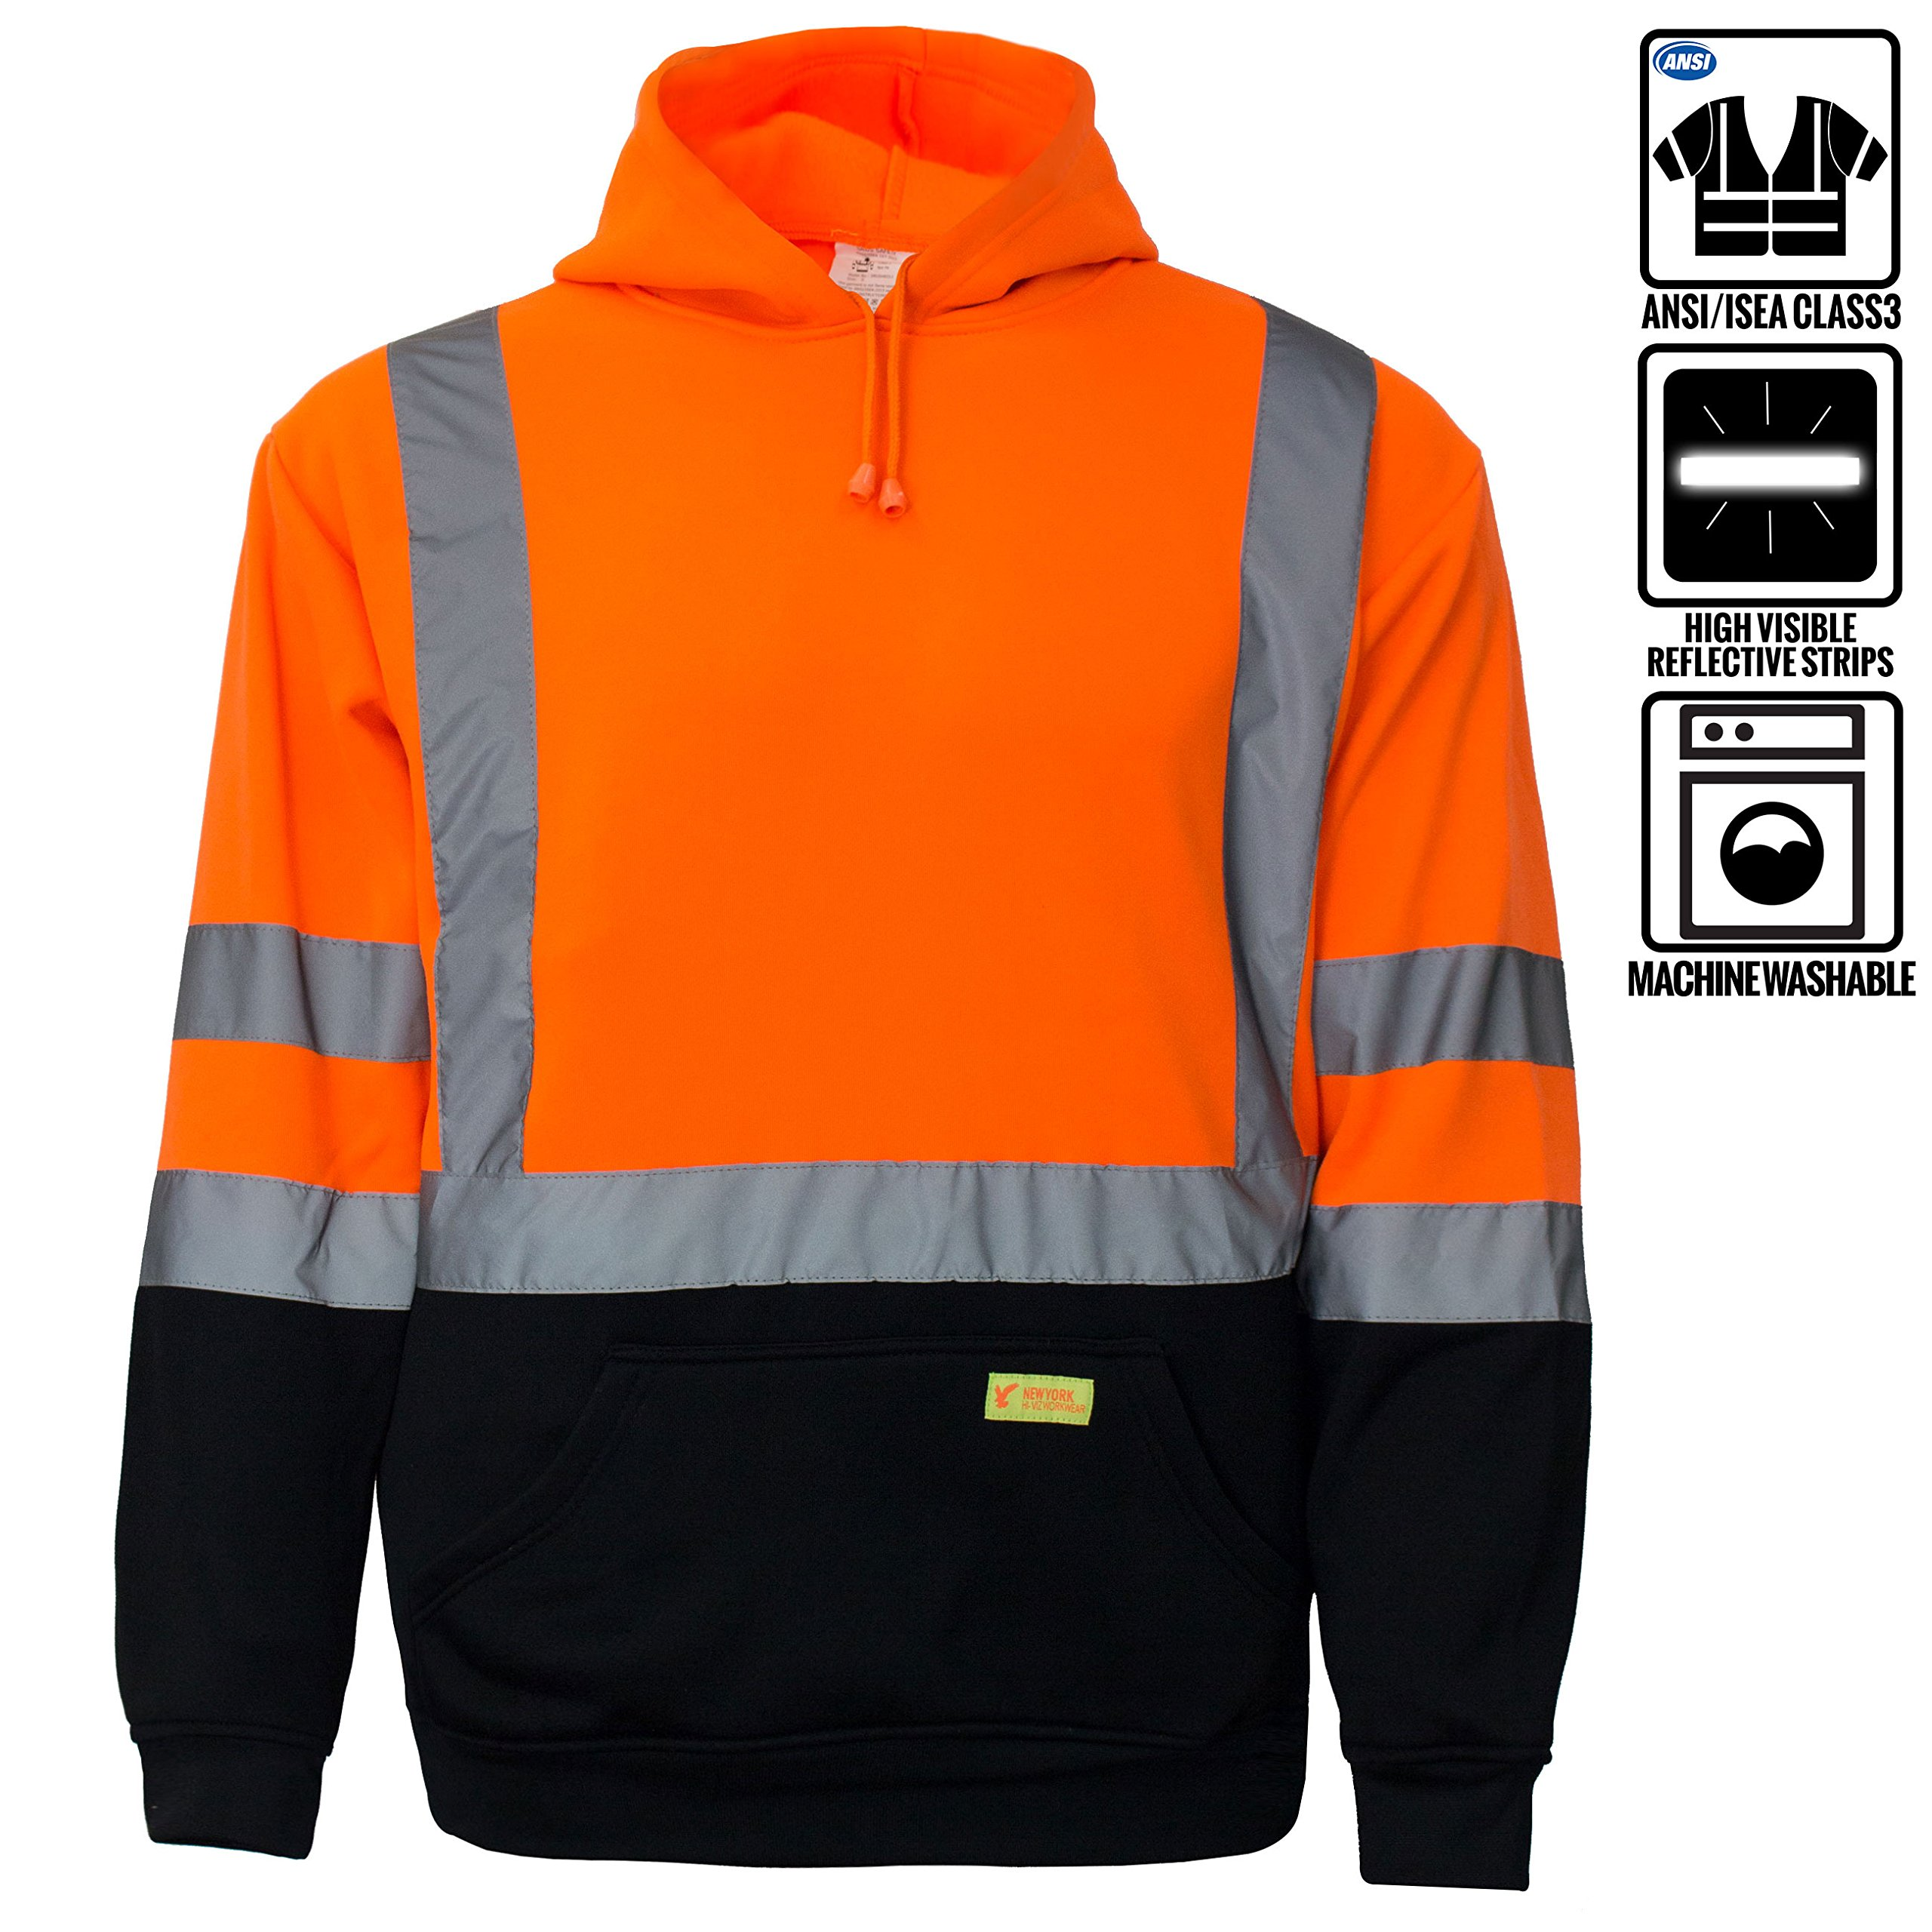 New York Hi-Viz Workwear H8311 Men's ANSI Class 3 High Visibility Class 3 Sweatshirt, Hooded Pullover, Knit Lining, Black Bottom (Orange, X-Large)